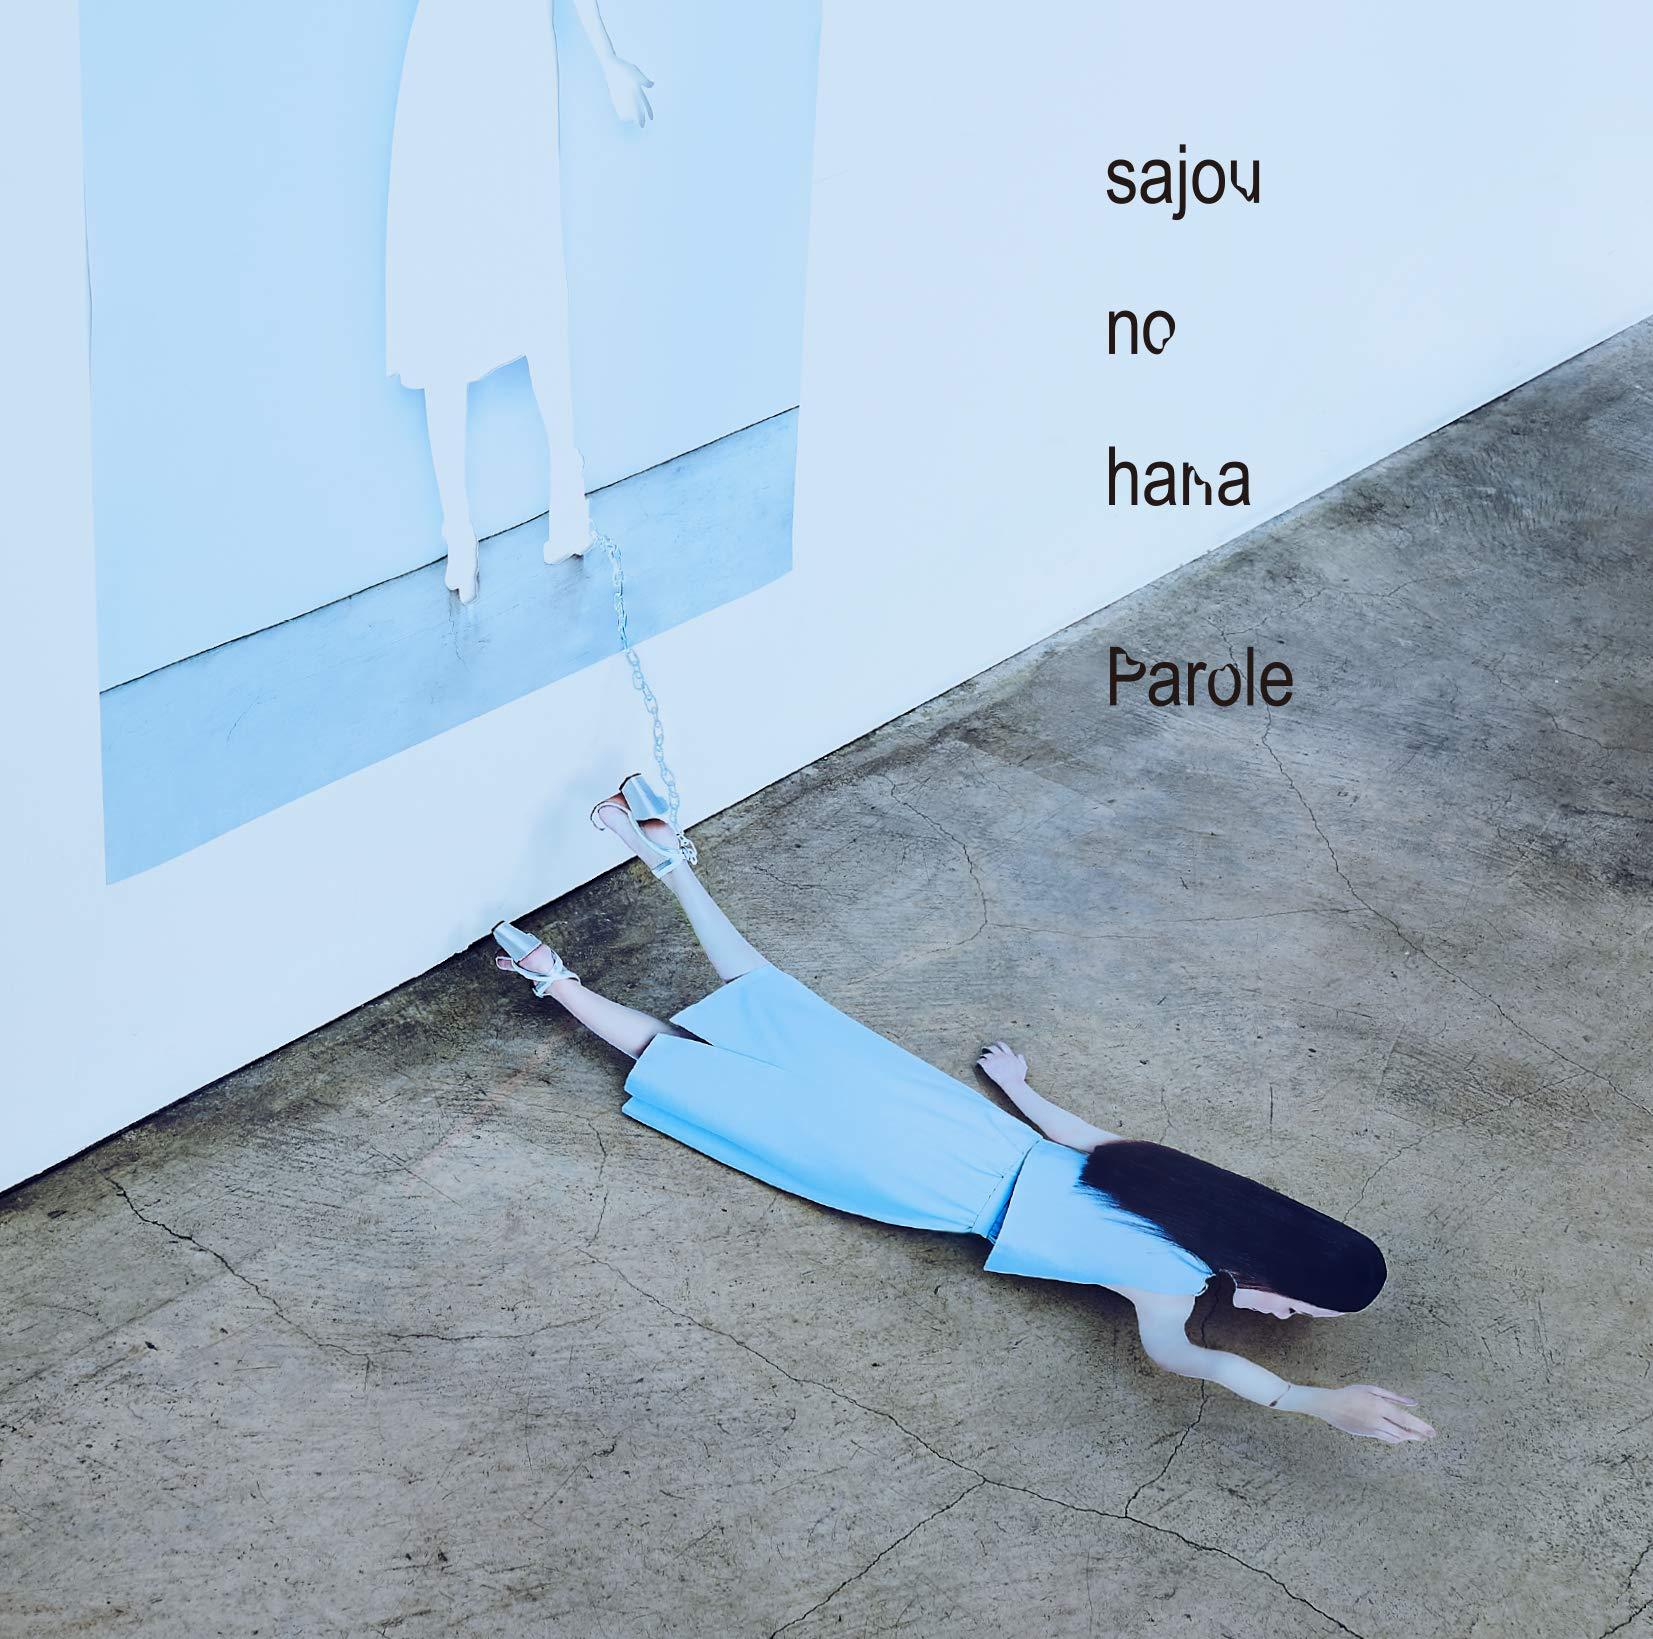 Parole/sajou no hana